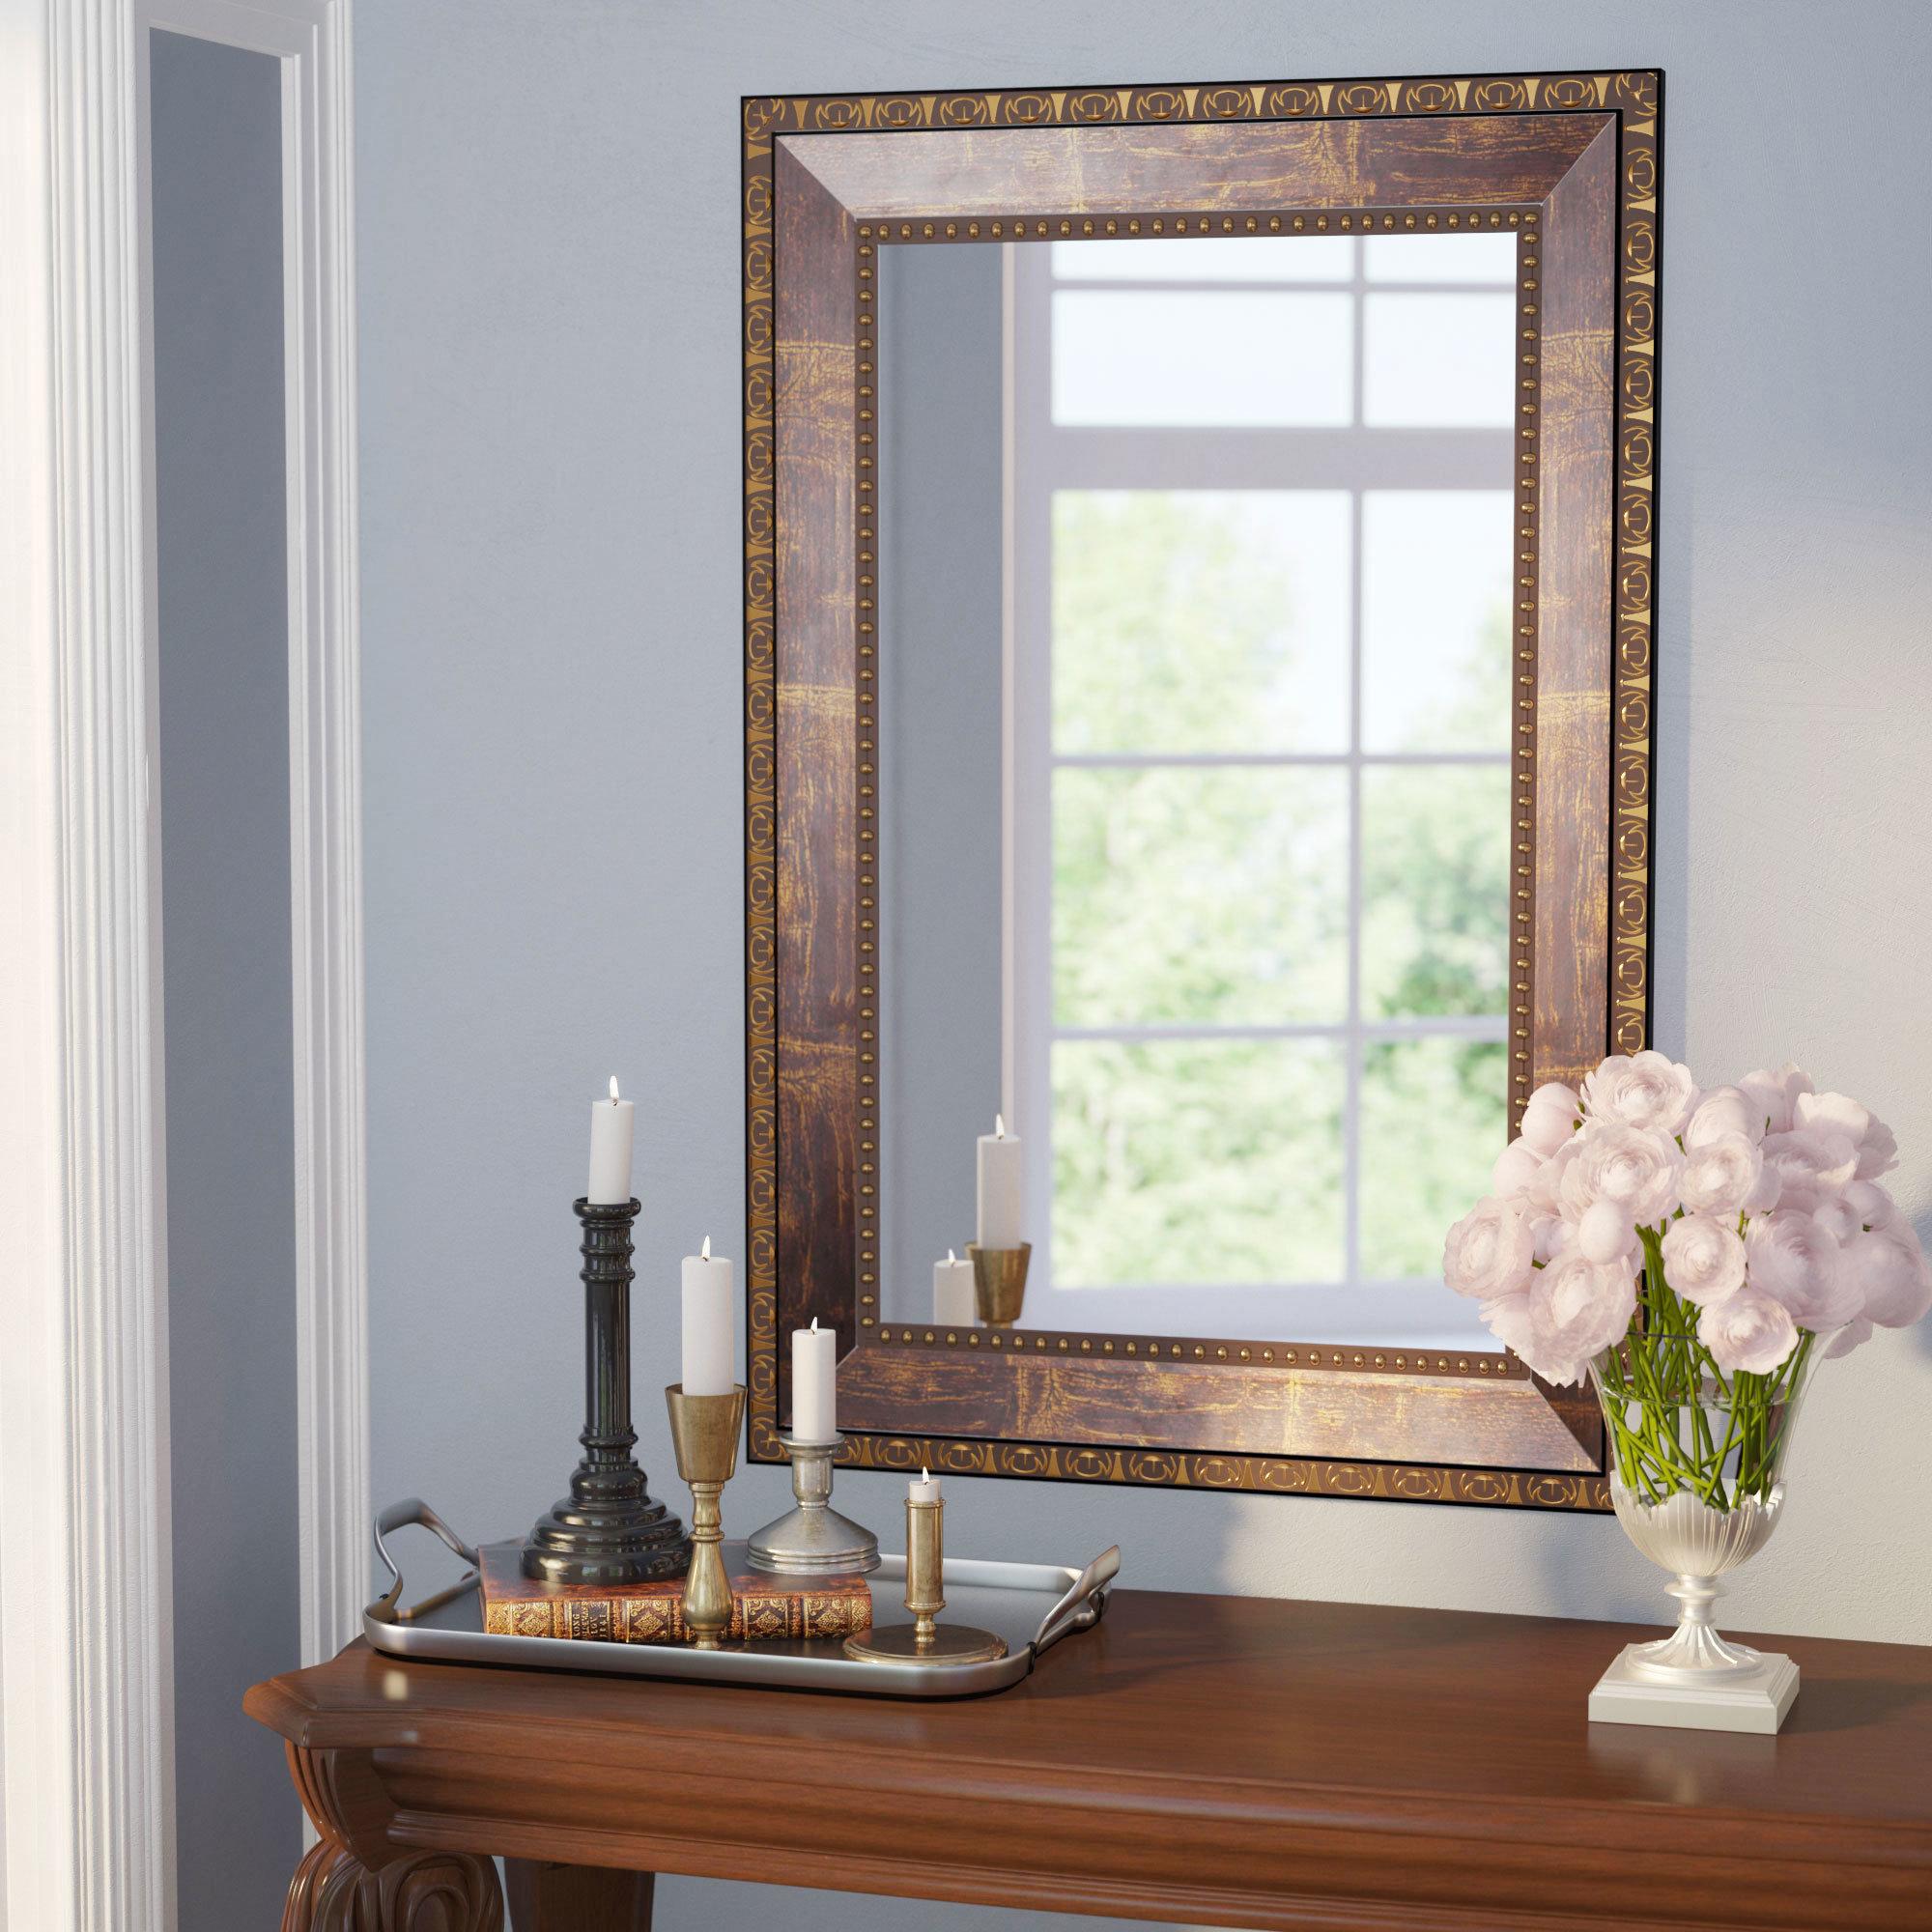 Traditional Square Copper Bronze Accent Mirror Intended For Traditional Square Glass Wall Mirrors (View 10 of 20)